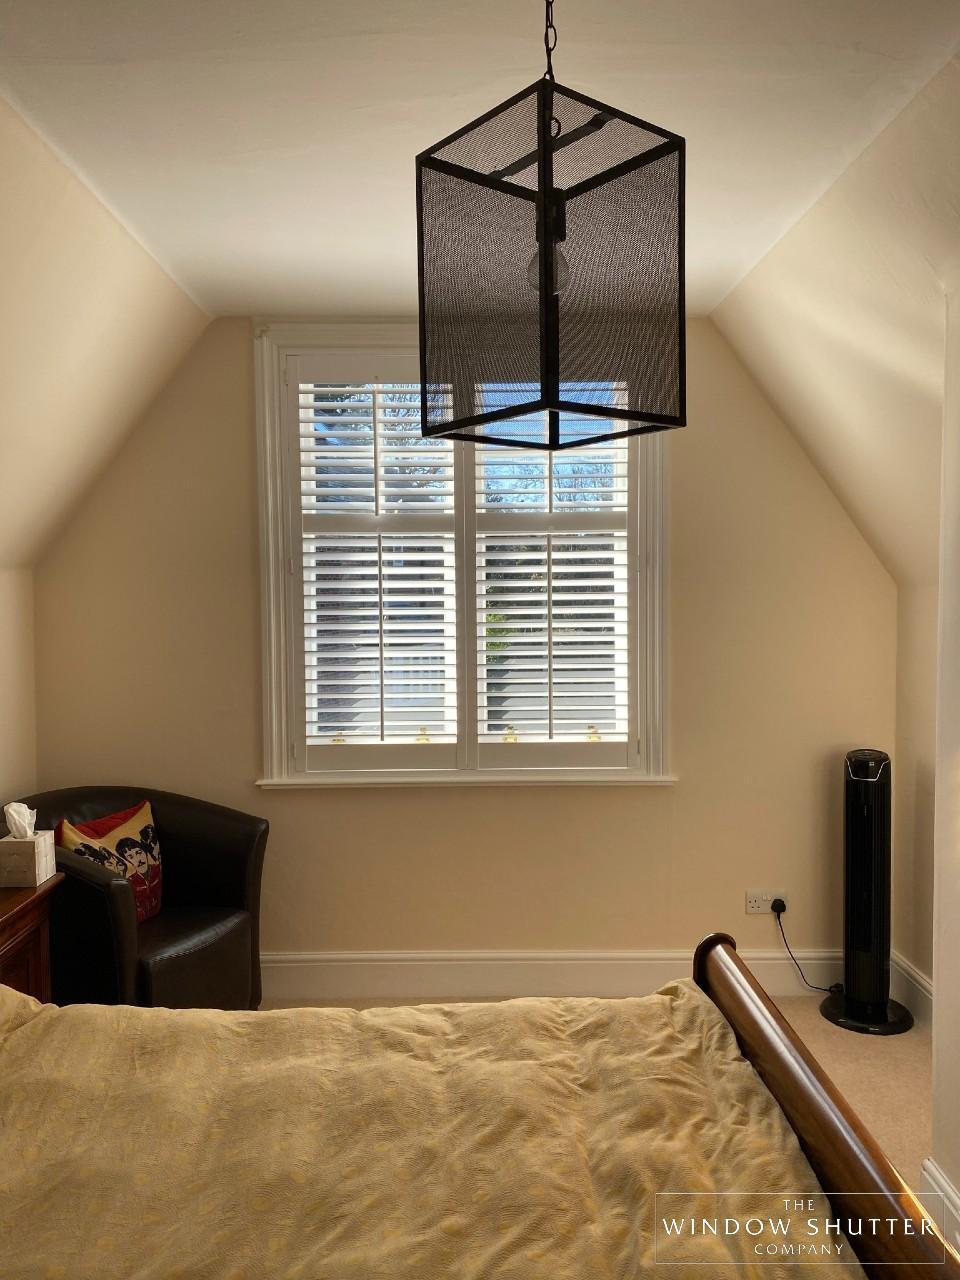 Full height shutters, mdf